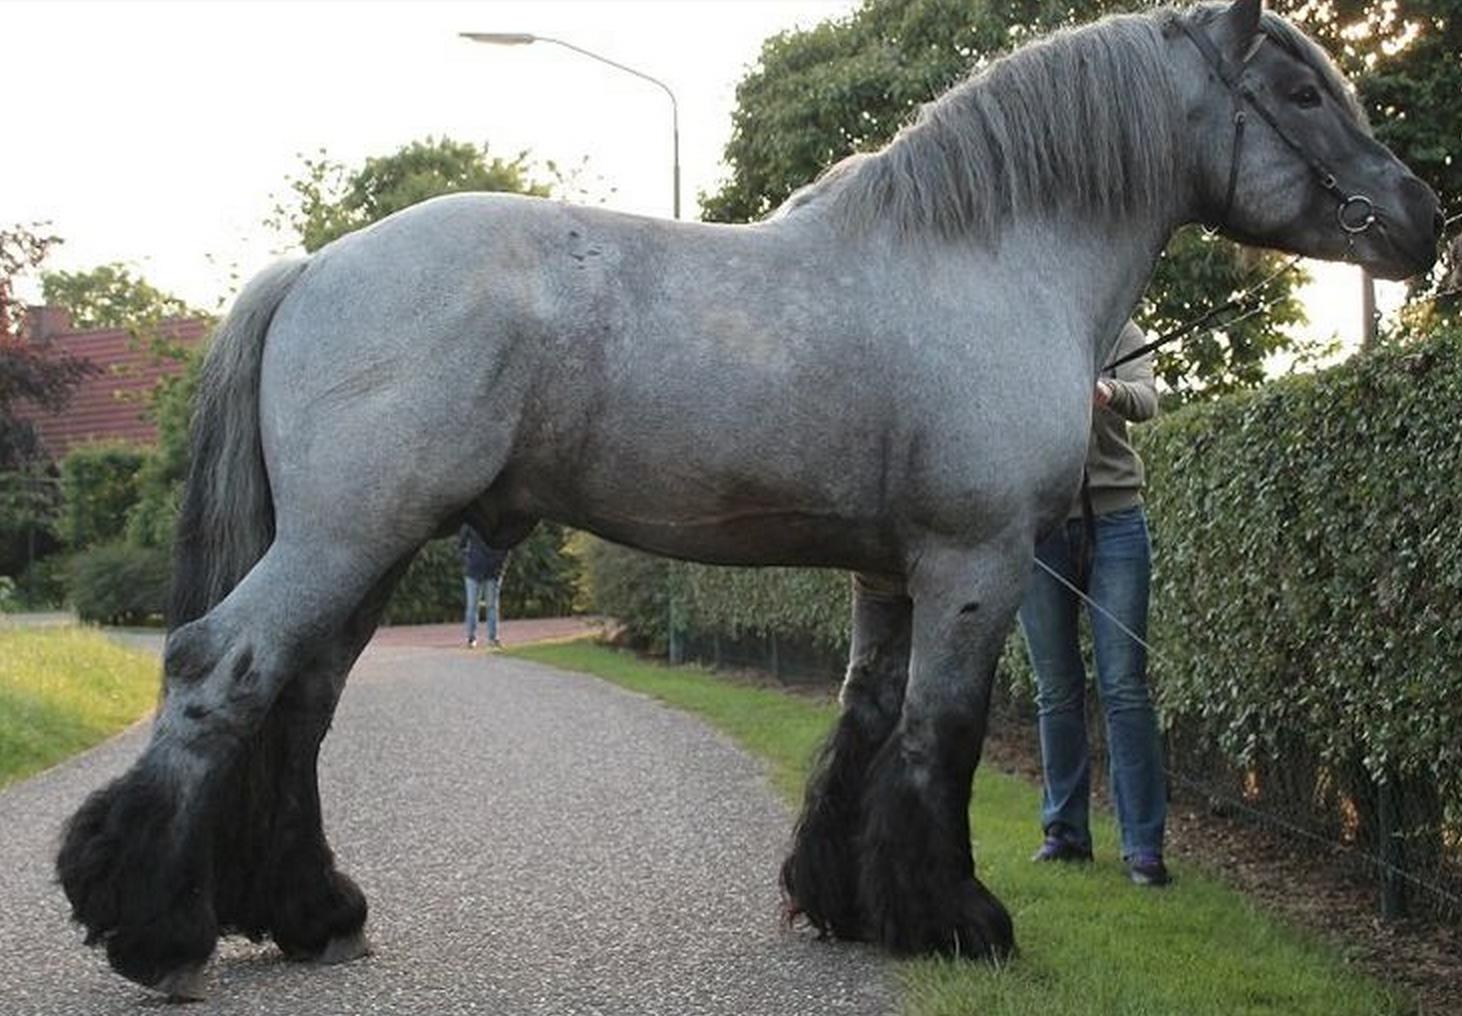 Whoa! Big horse peeking over the tall hedge. Dutch draft